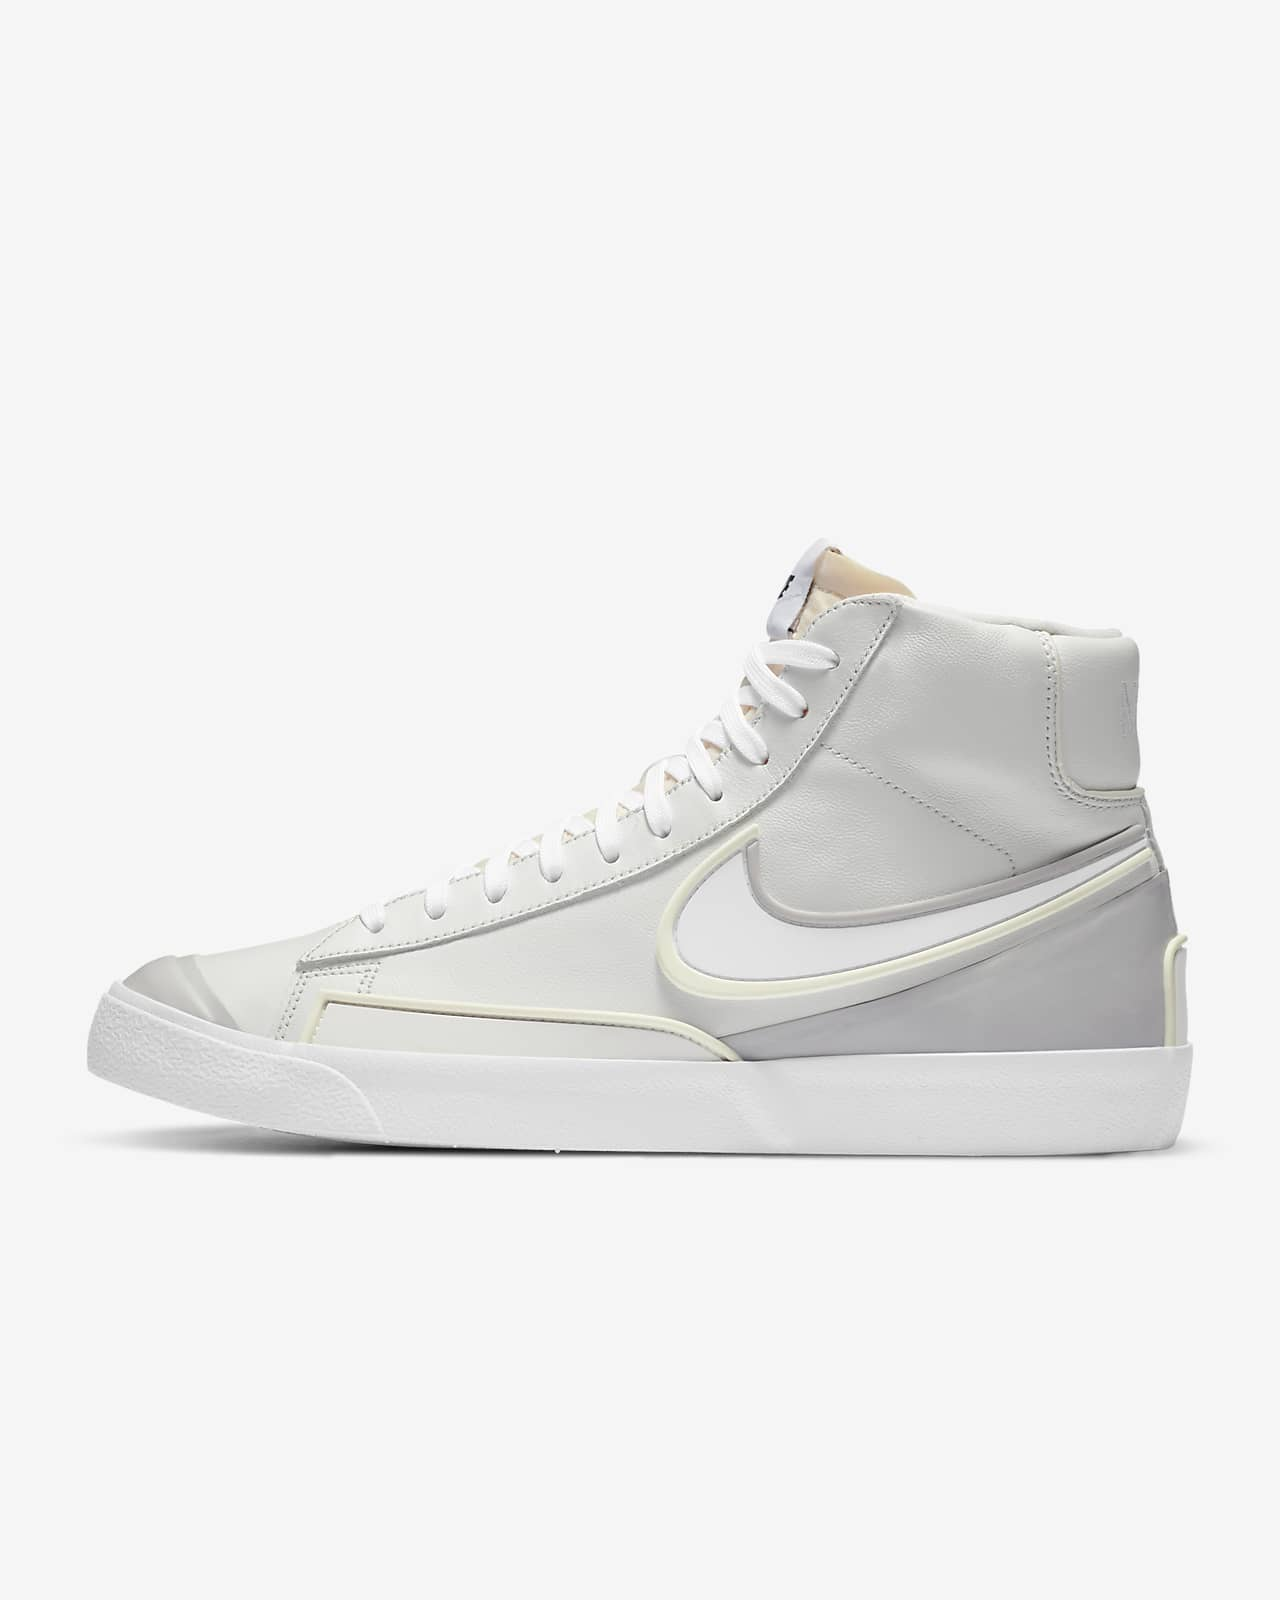 Nike Blazer Mid '77 Infinite Men's Shoe